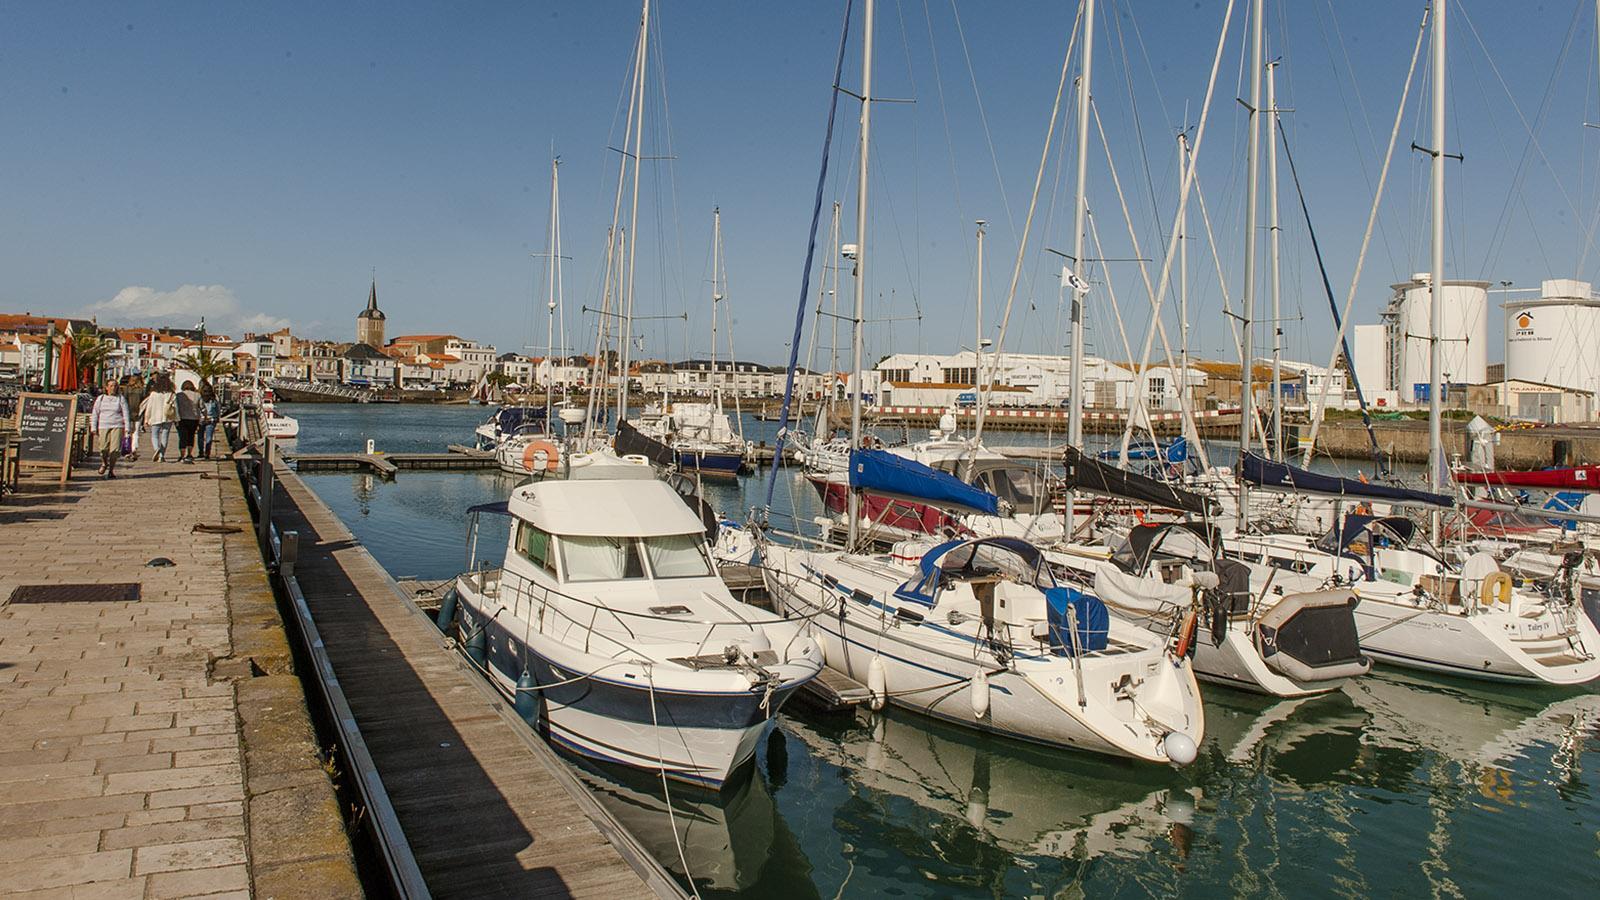 Der Hafen von Les Sables d'Olonne. Foto: Hilke Maunder